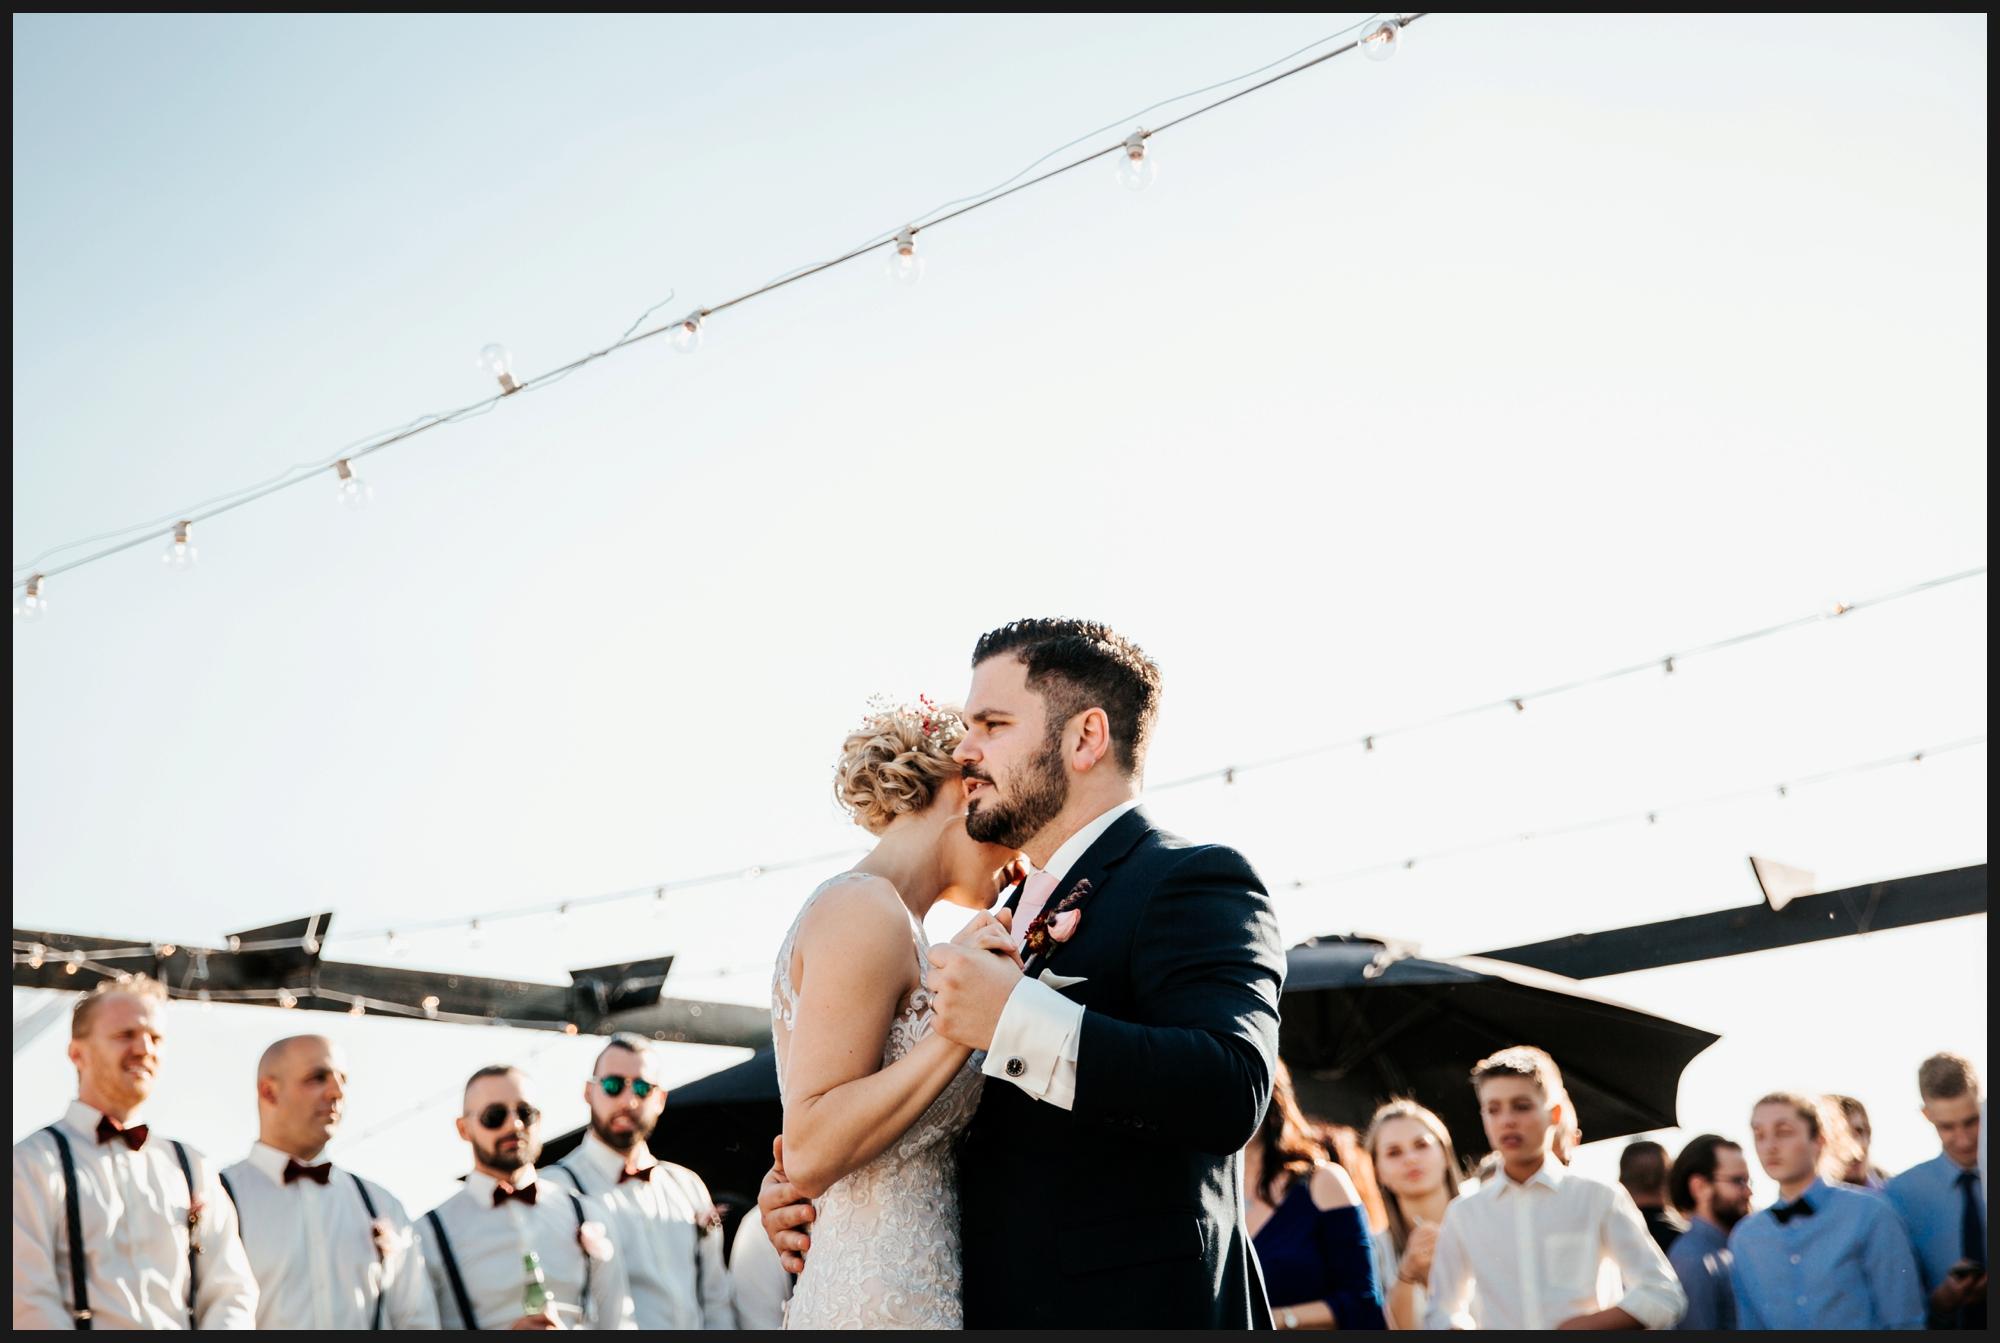 Orlando-Wedding-Photographer-destination-wedding-photographer-florida-wedding-photographer-hawaii-wedding-photographer_0608.jpg